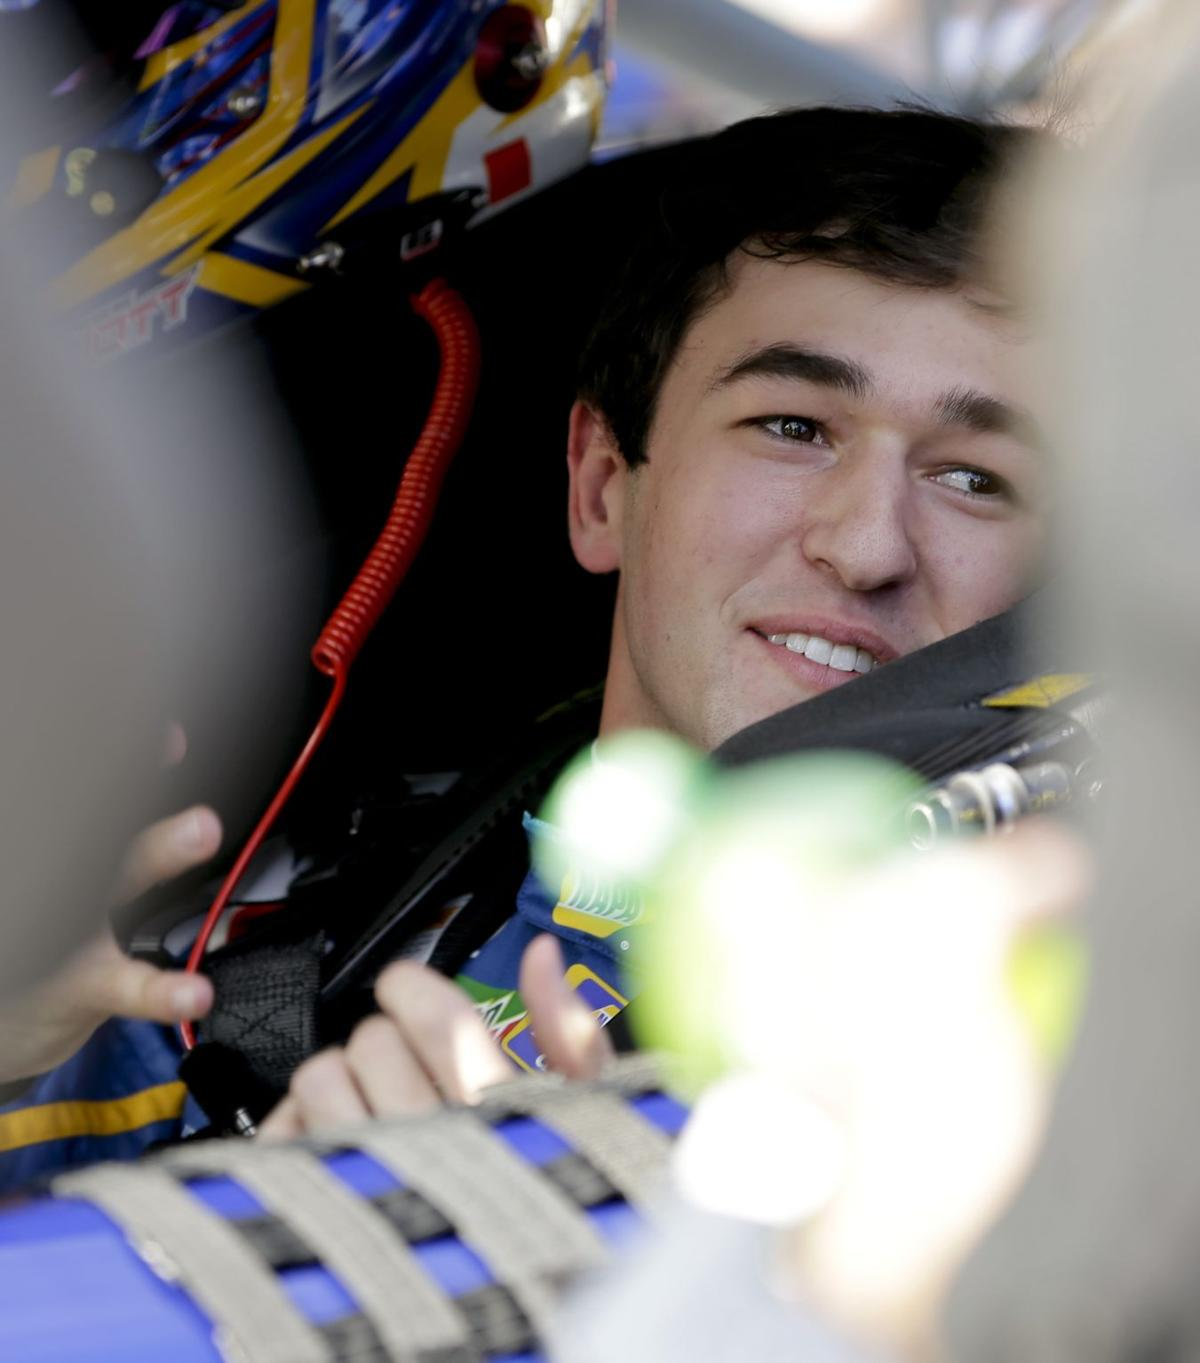 Rookie Elliott youngest on Daytona 500 pole